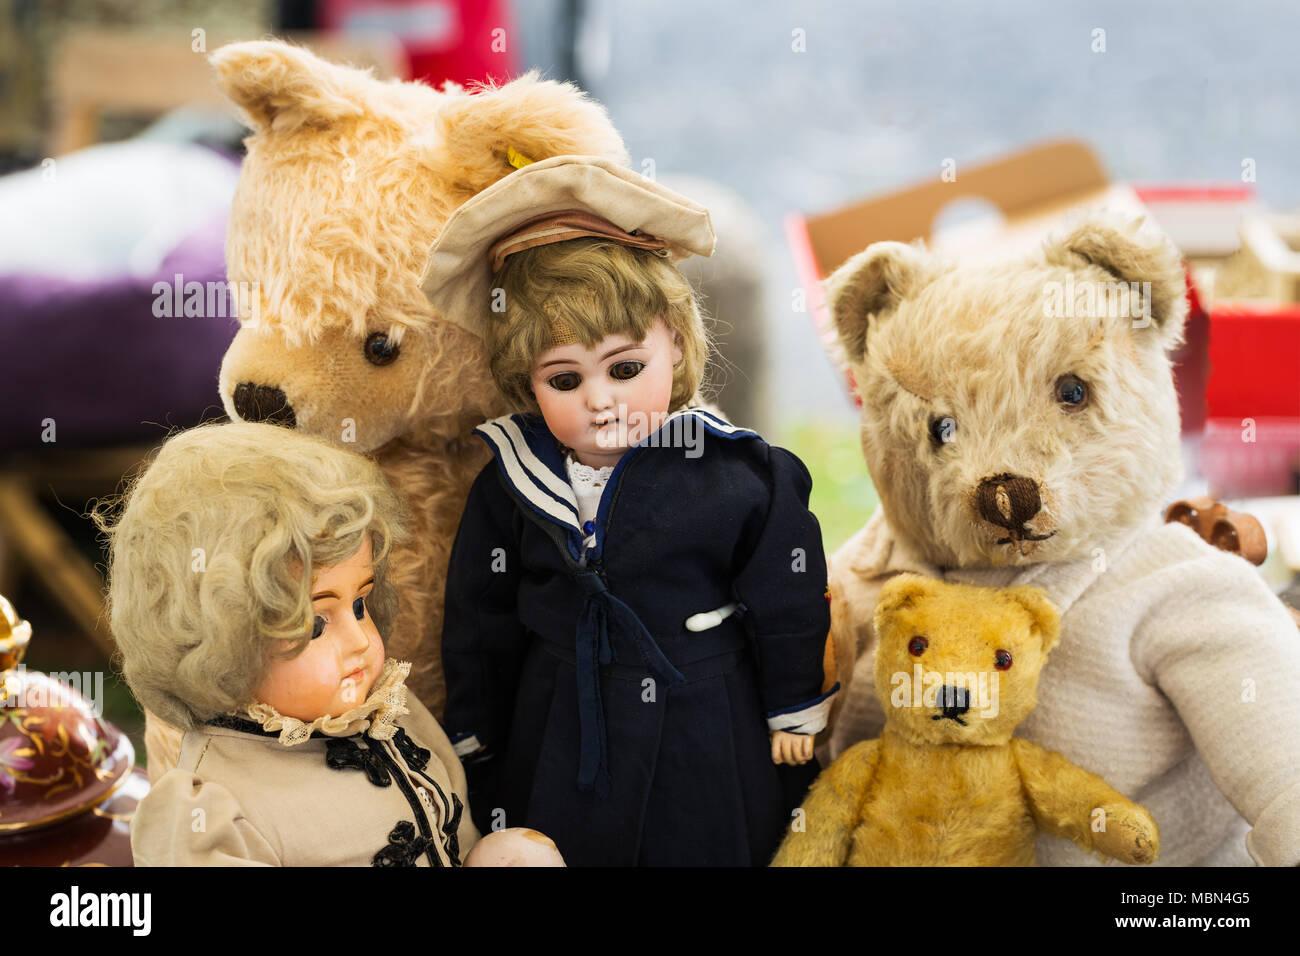 Teddies and dolls at flea market - Stock Image